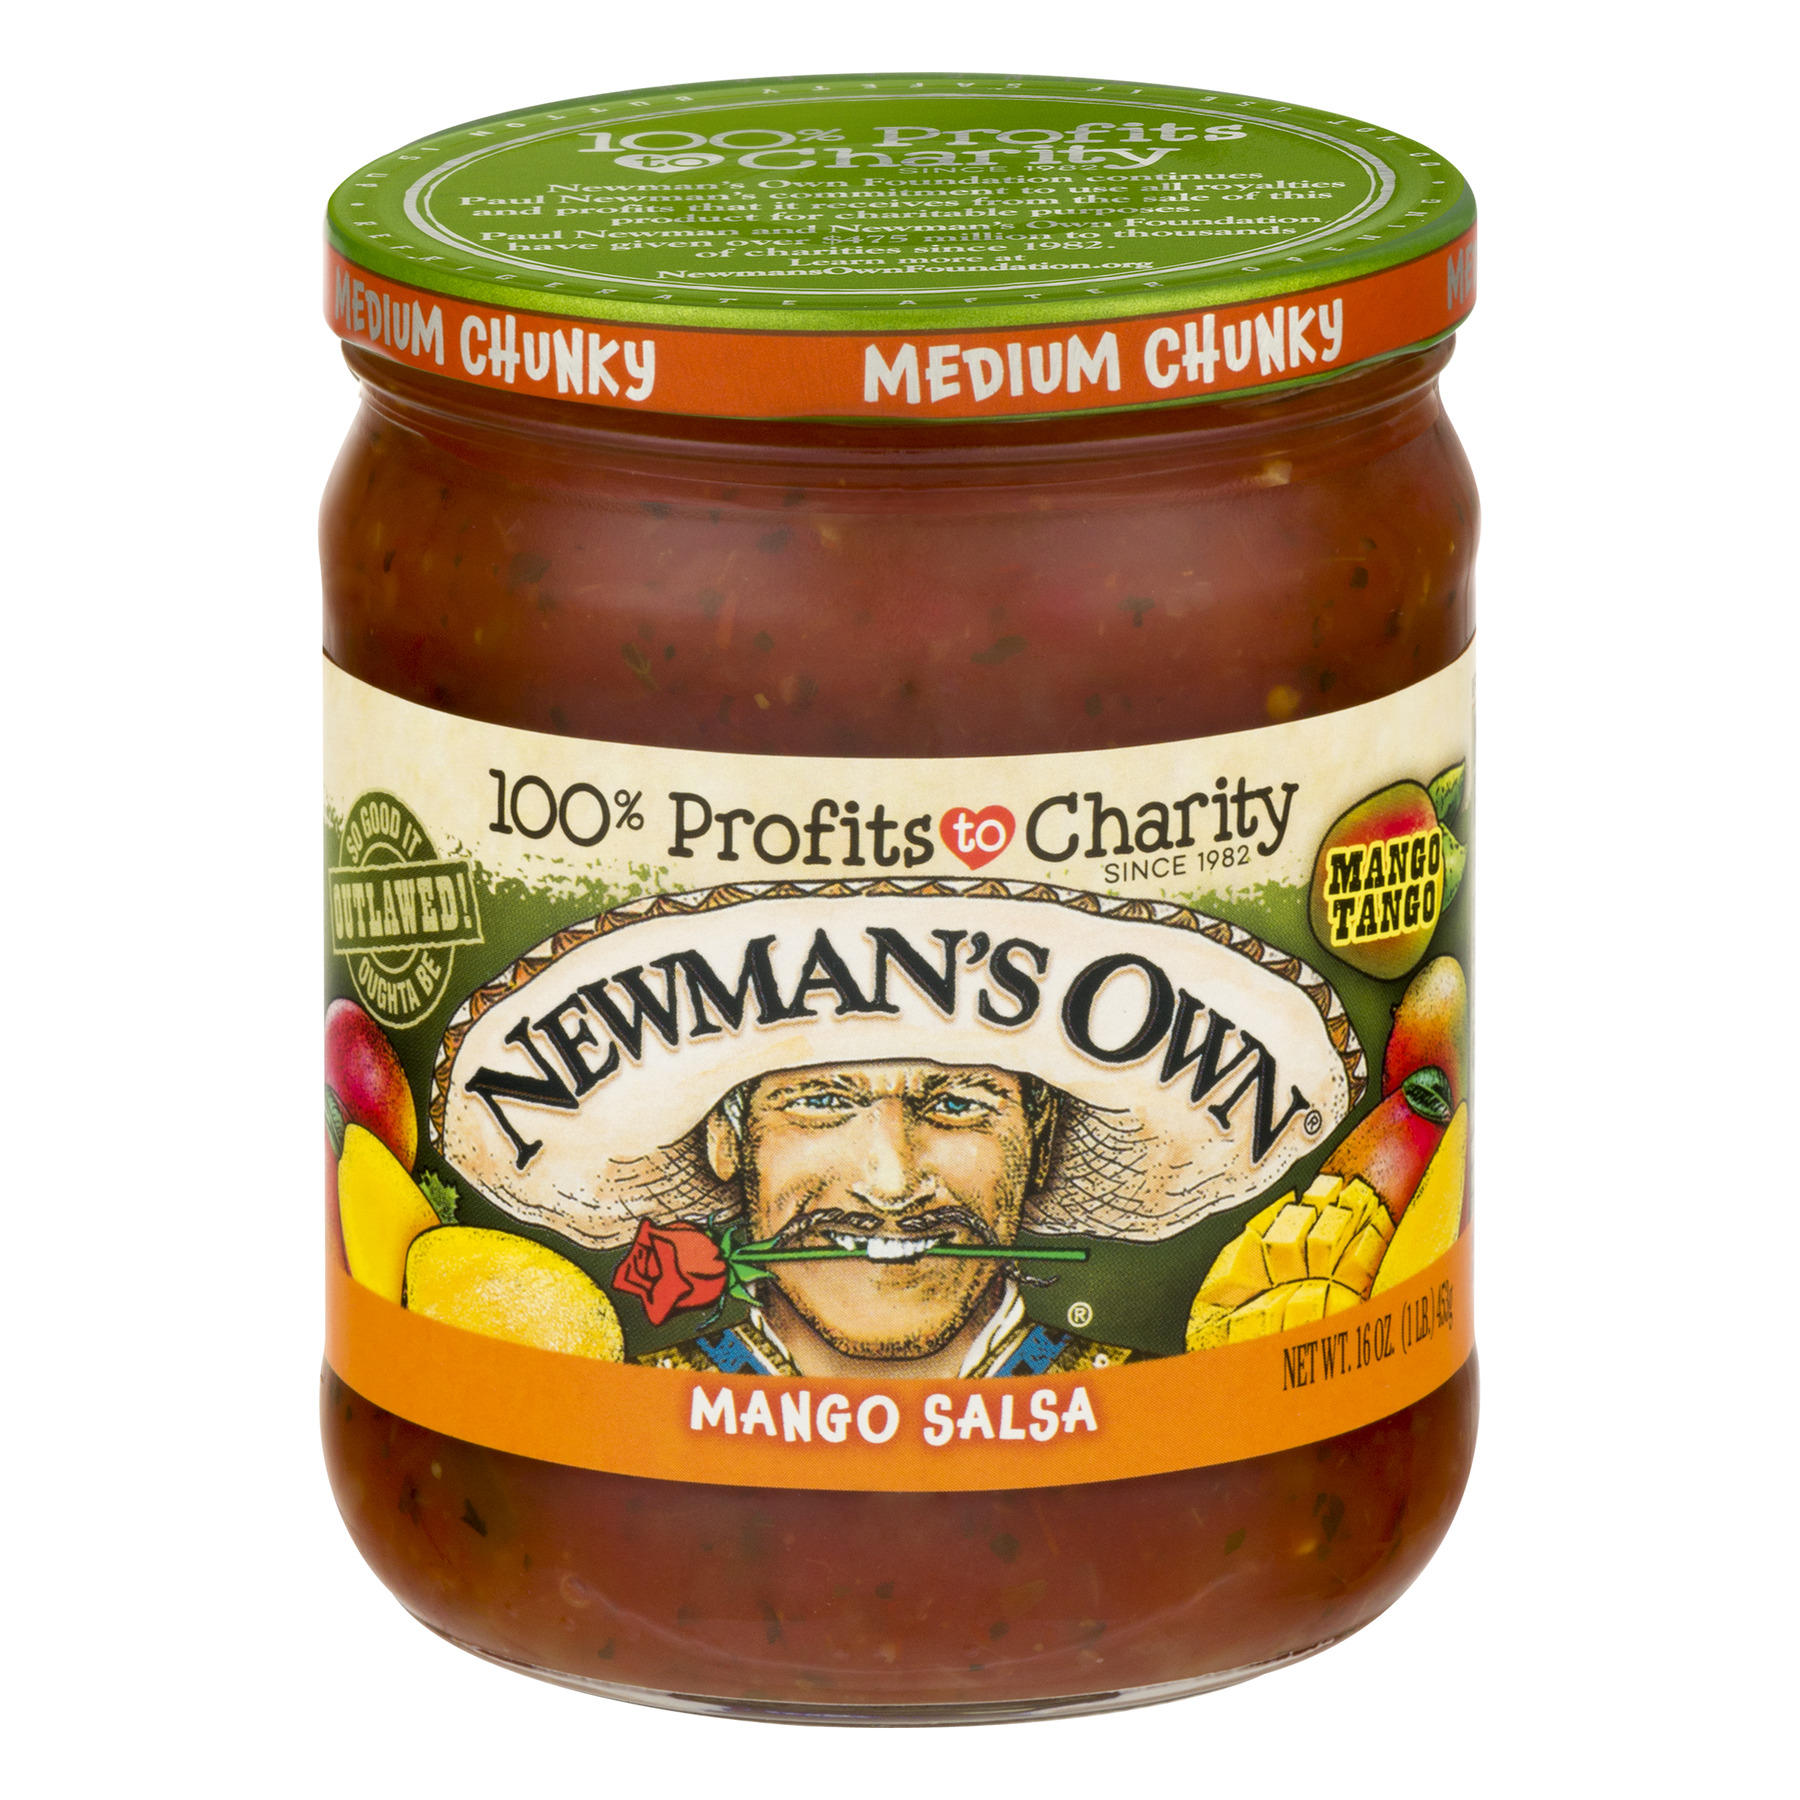 Newmans Own Salsa Medium Chunky Mango Jar - 16 Oz